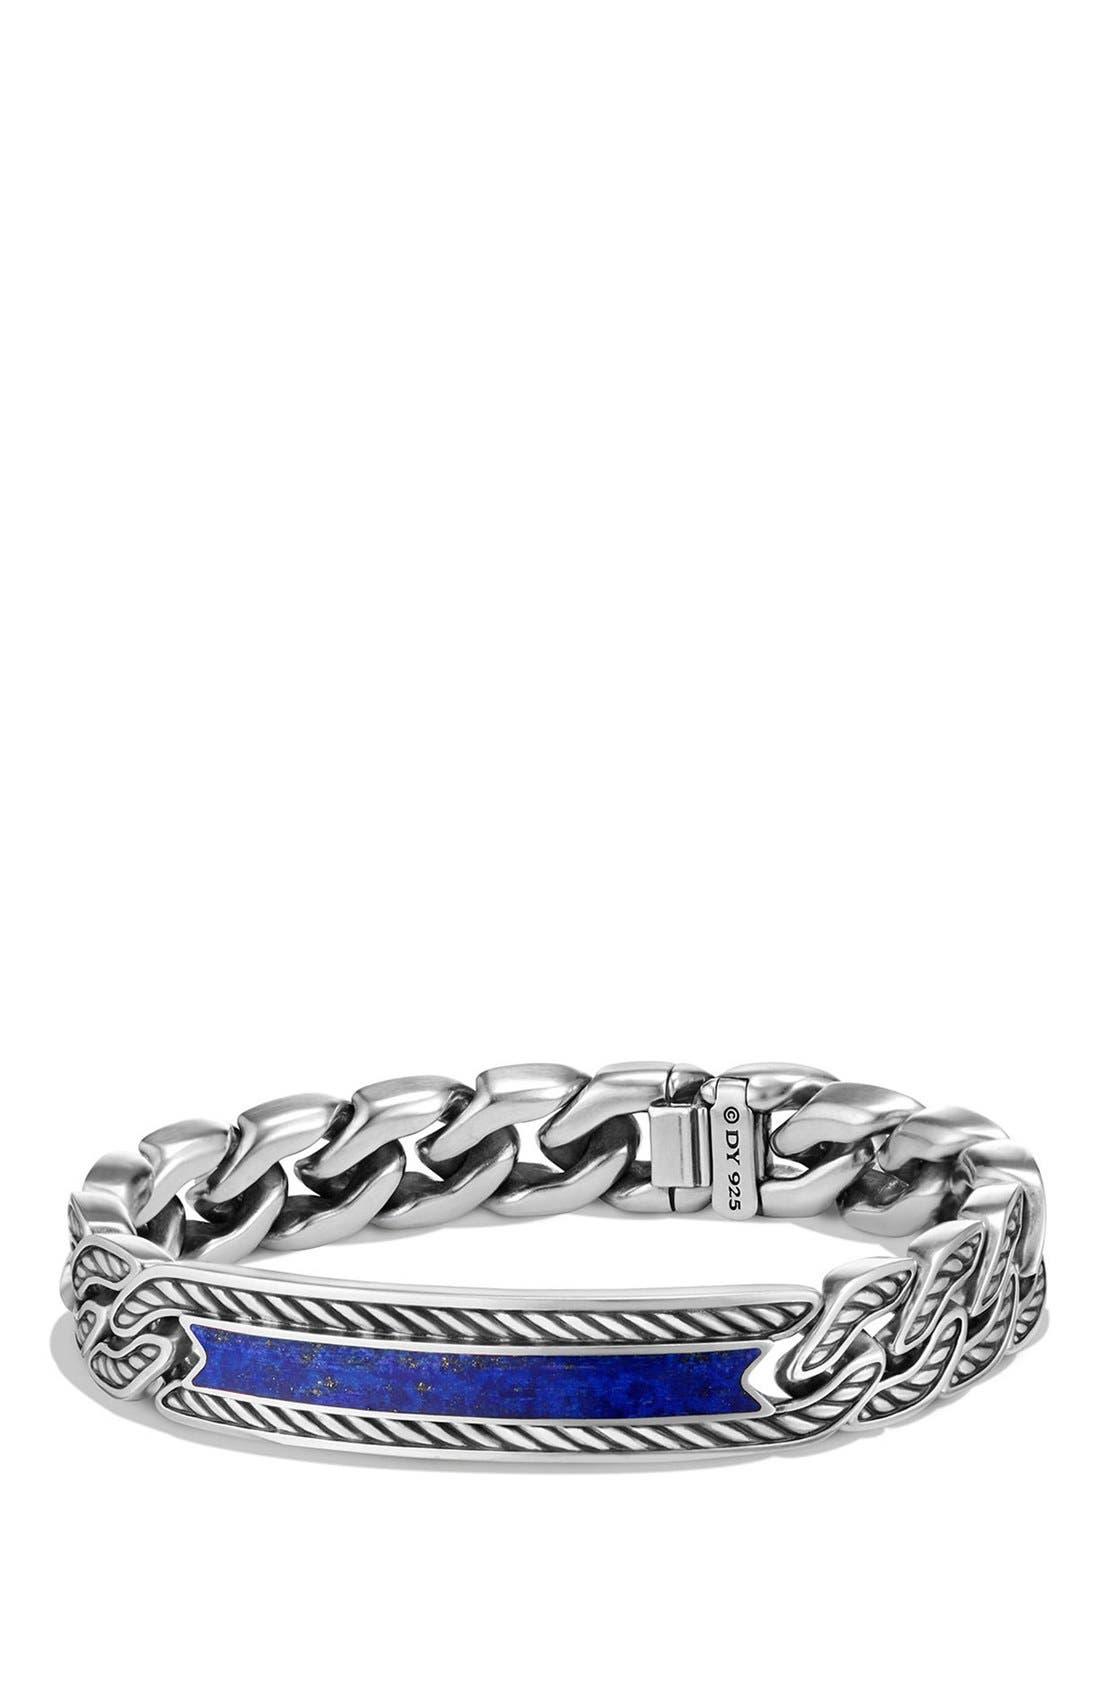 DAVID YURMAN Maritime Curb Link ID Bracelet